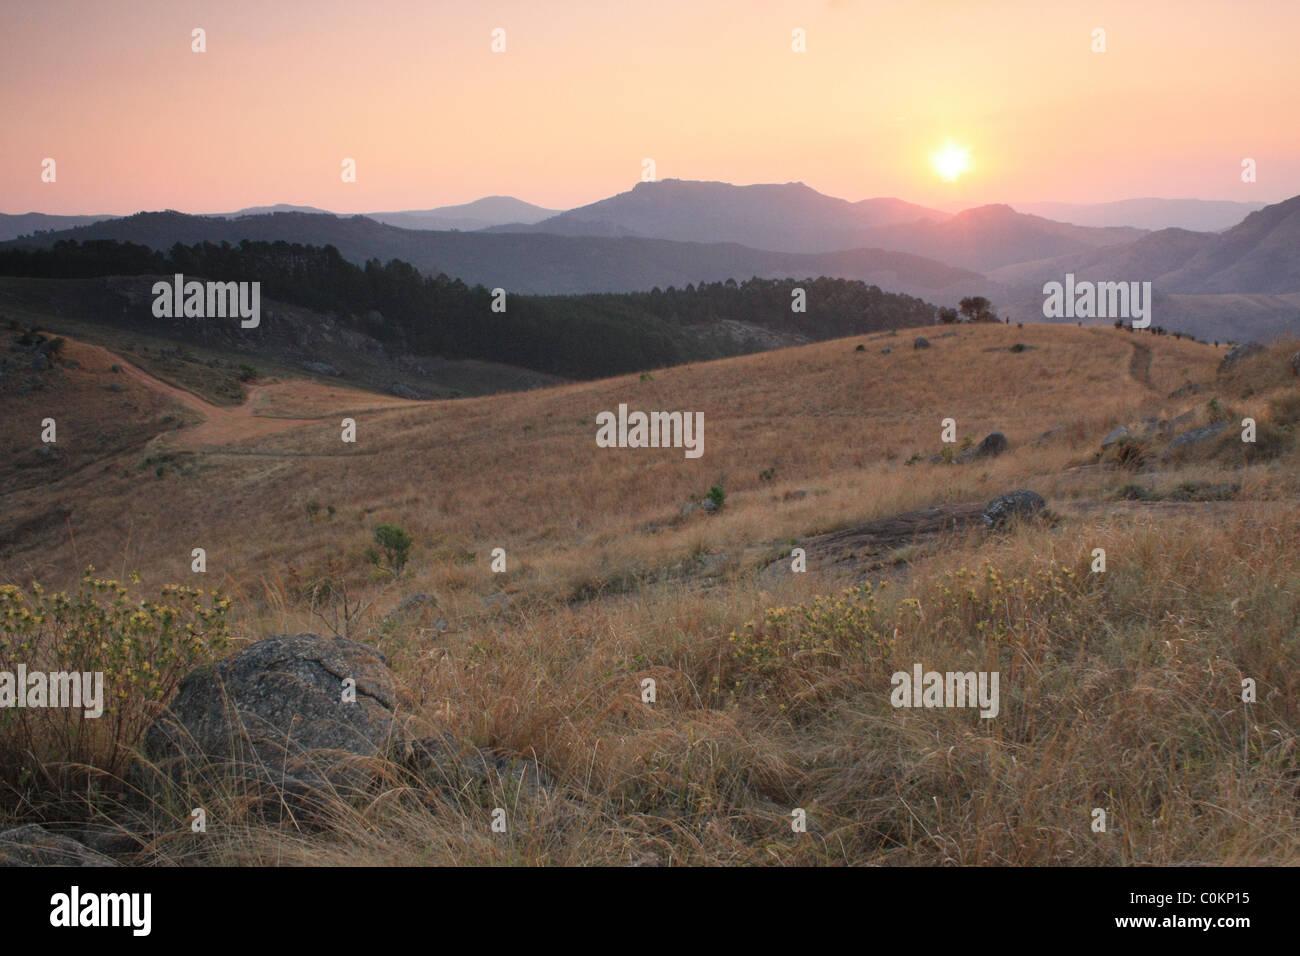 Sunset in the Mliliwane Hills, Swaziland Stock Photo